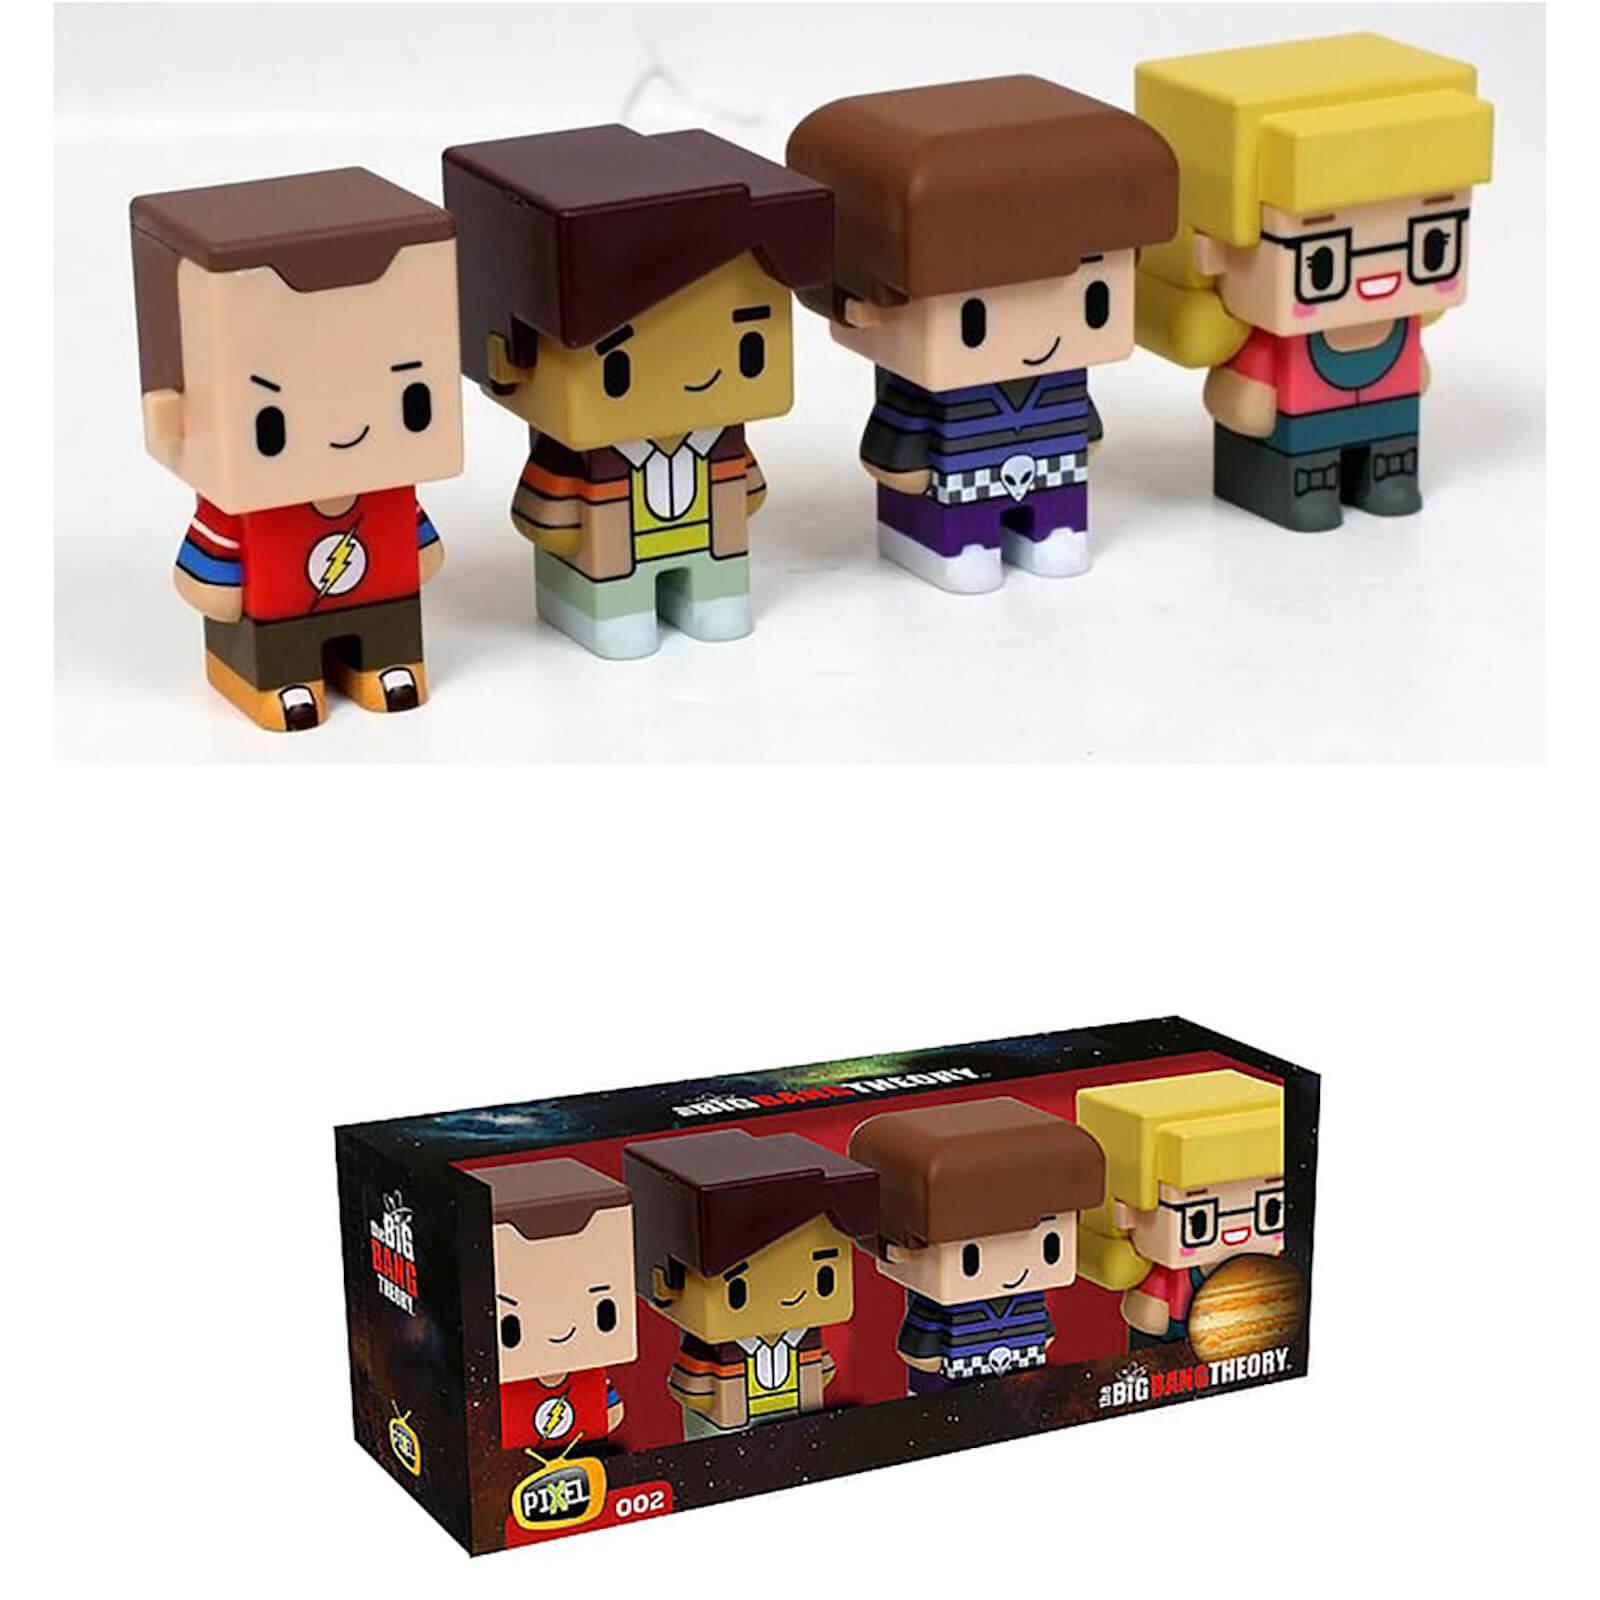 SD Toys Pixel Figure Big Bang Theory Set of 4 Figures 7cm